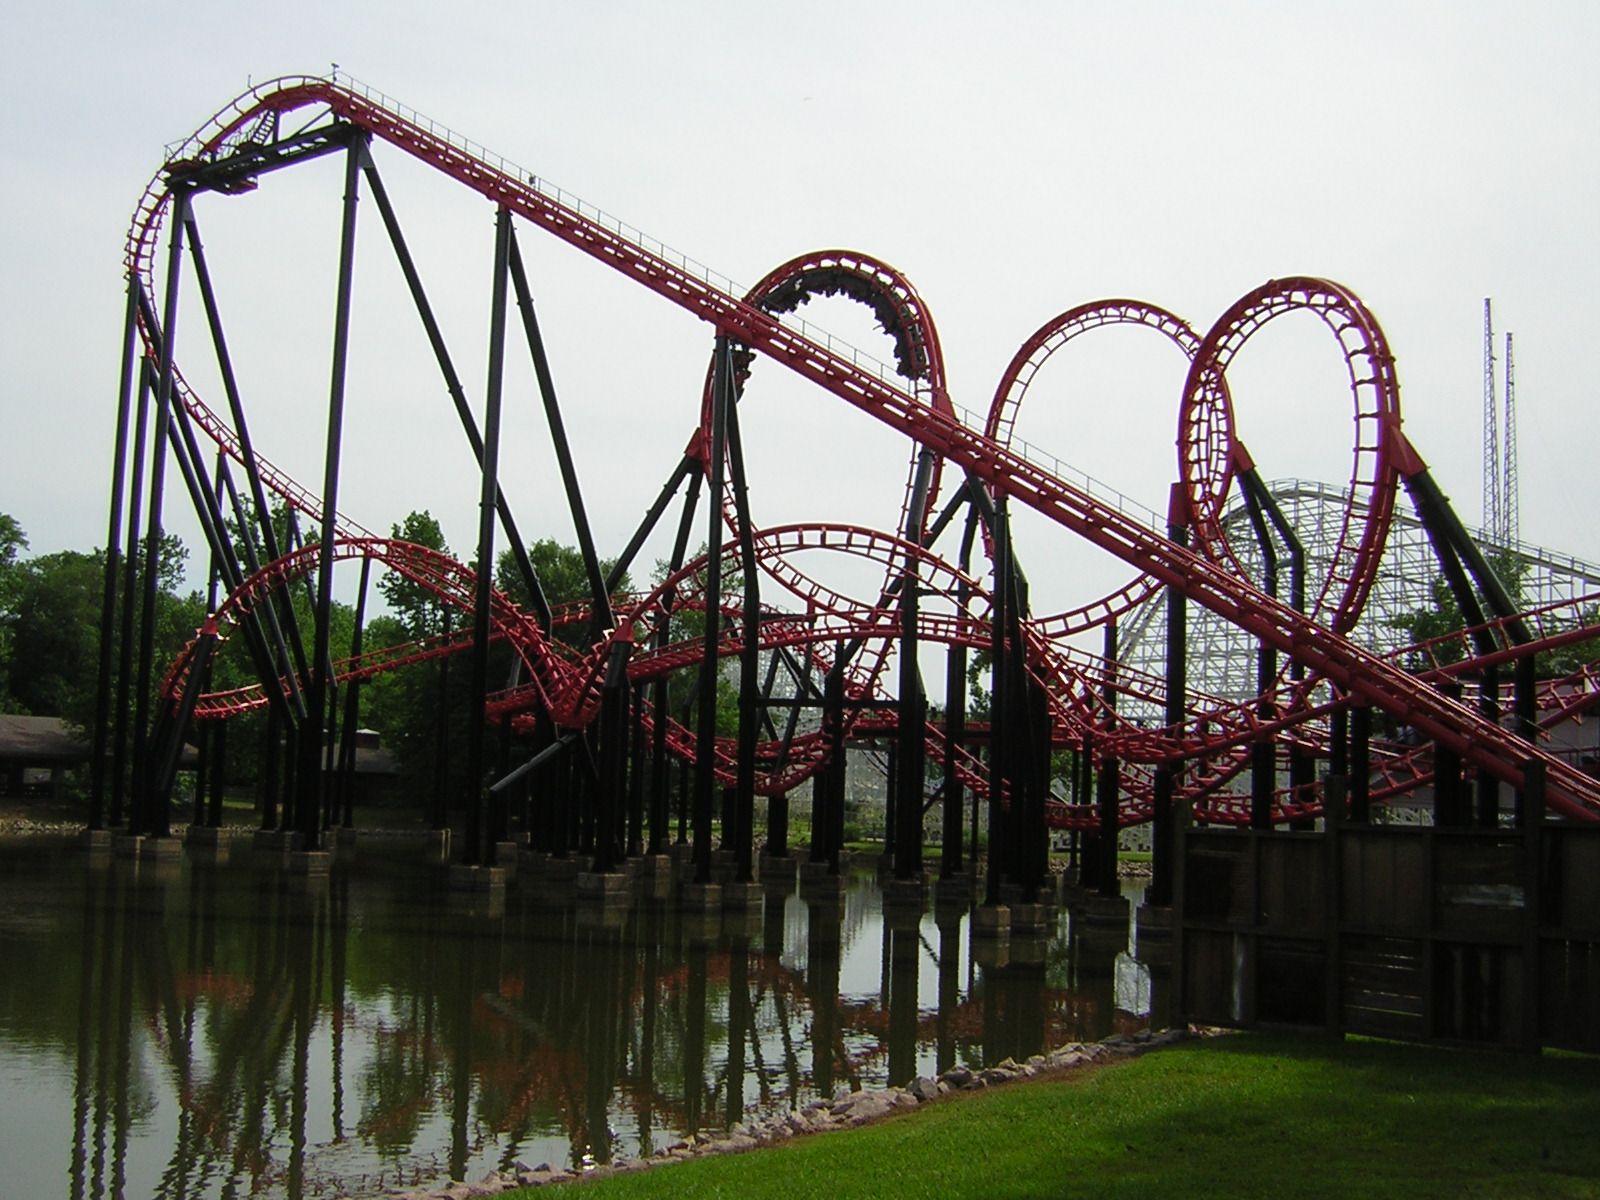 Ninja Ride Six Flags Over Georgia Atlanta Attractions Roller Coaster Six Flags